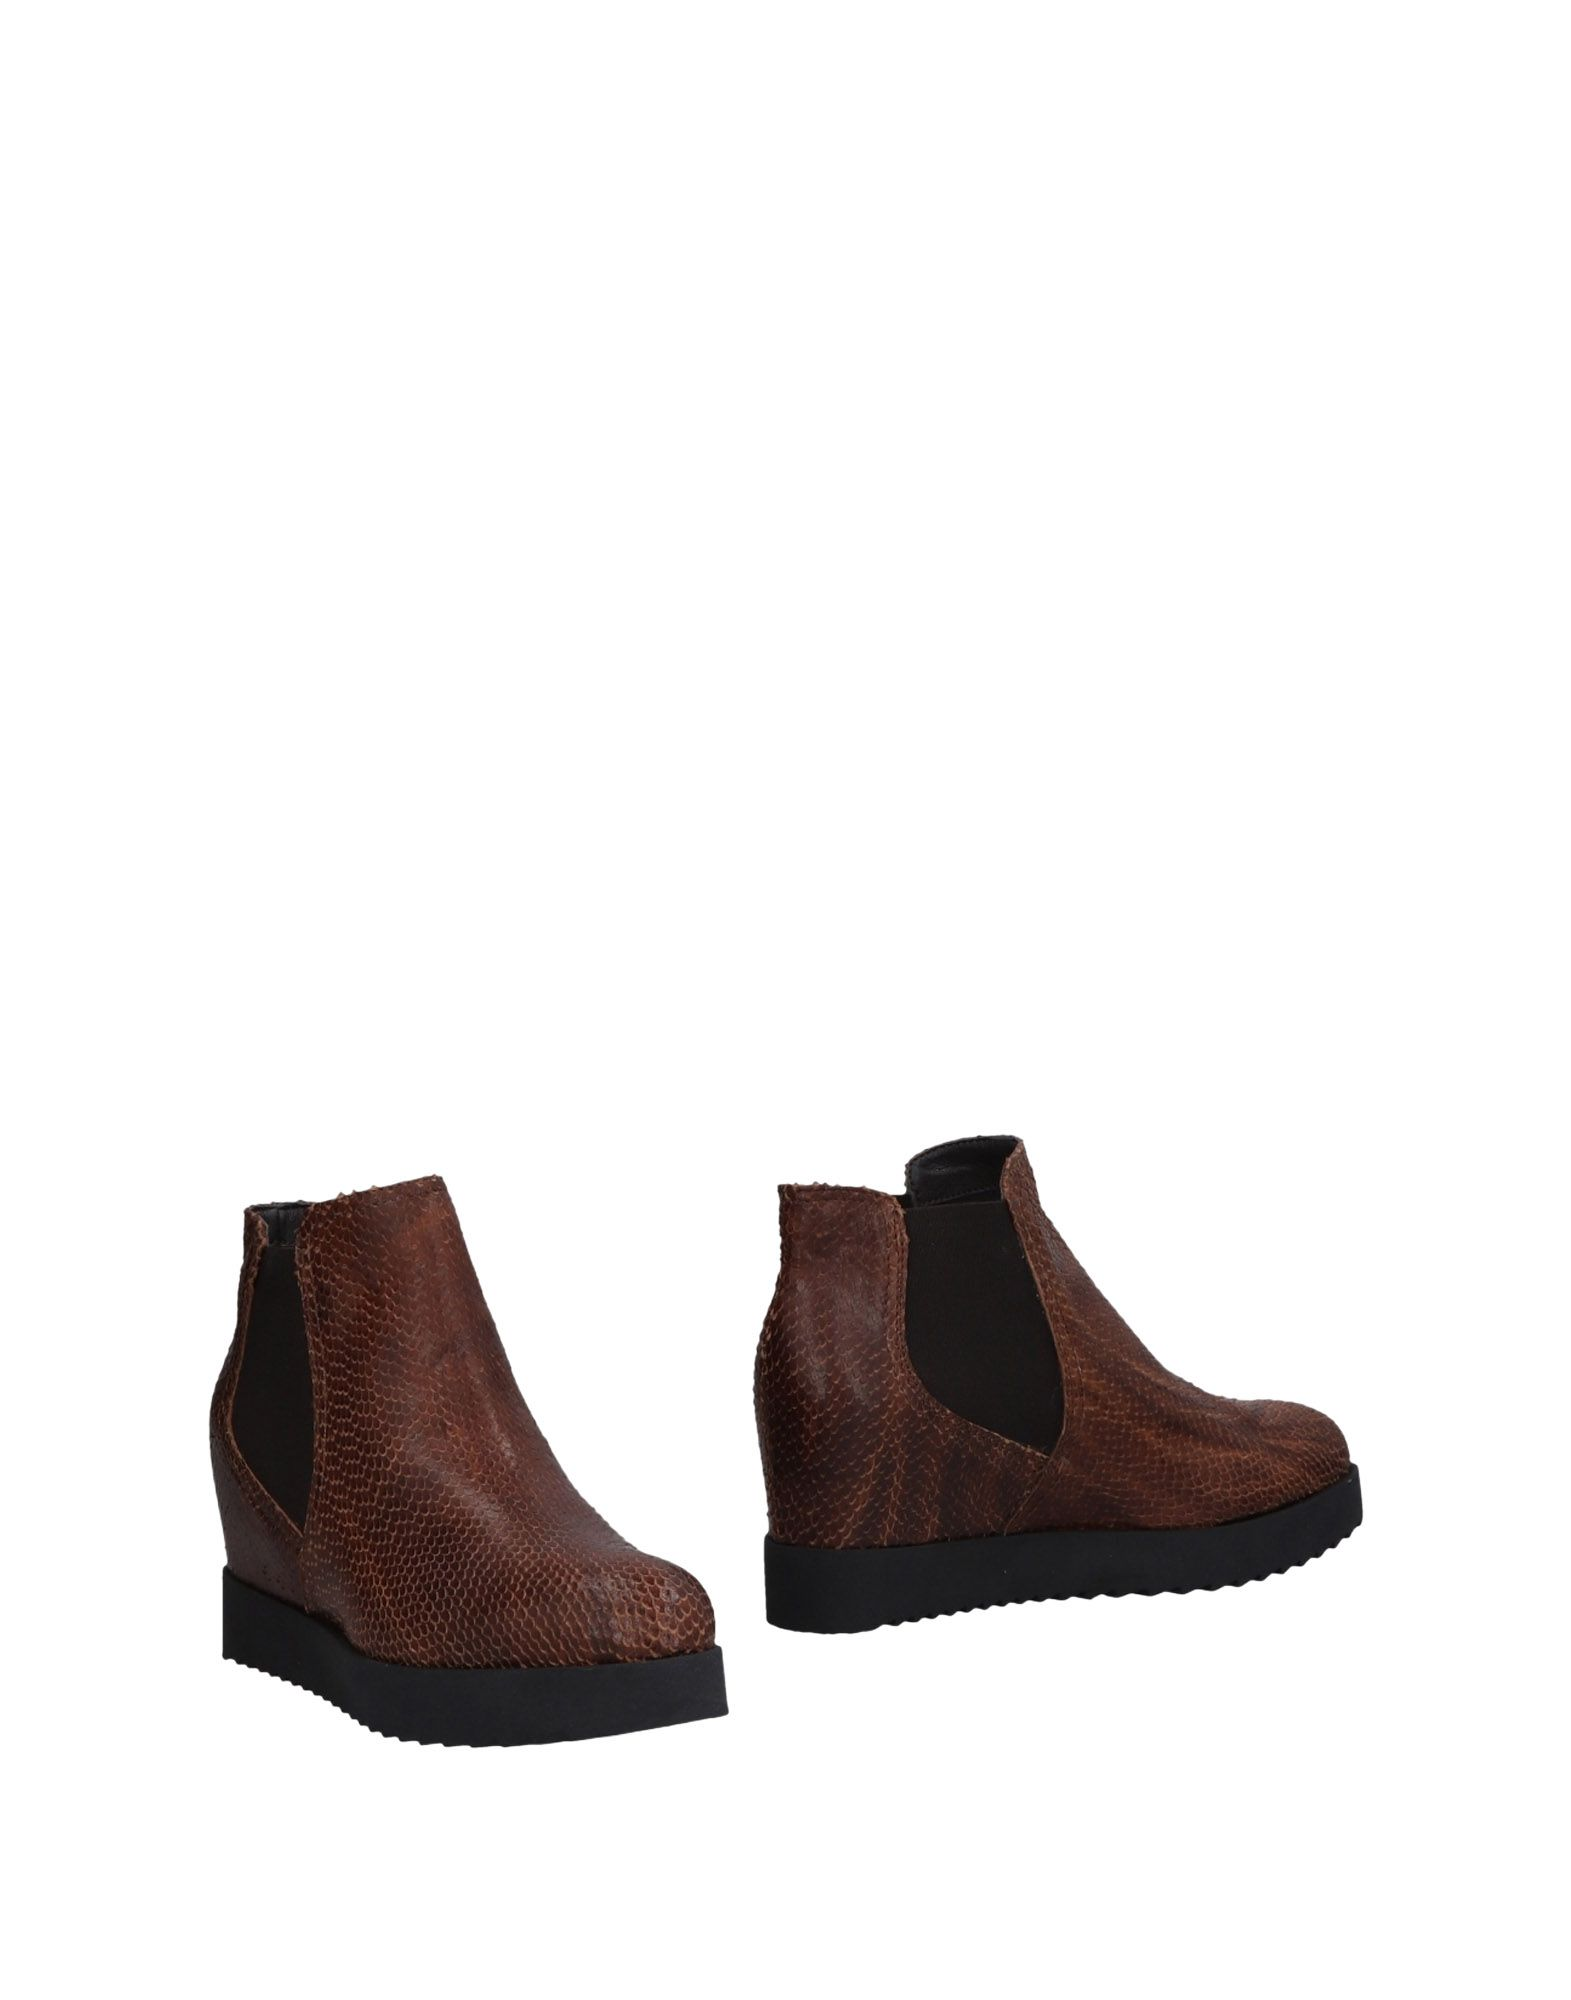 Formentini Chelsea Boots Boots Boots Damen  11479256PW Gute Qualität beliebte Schuhe 6efe7e